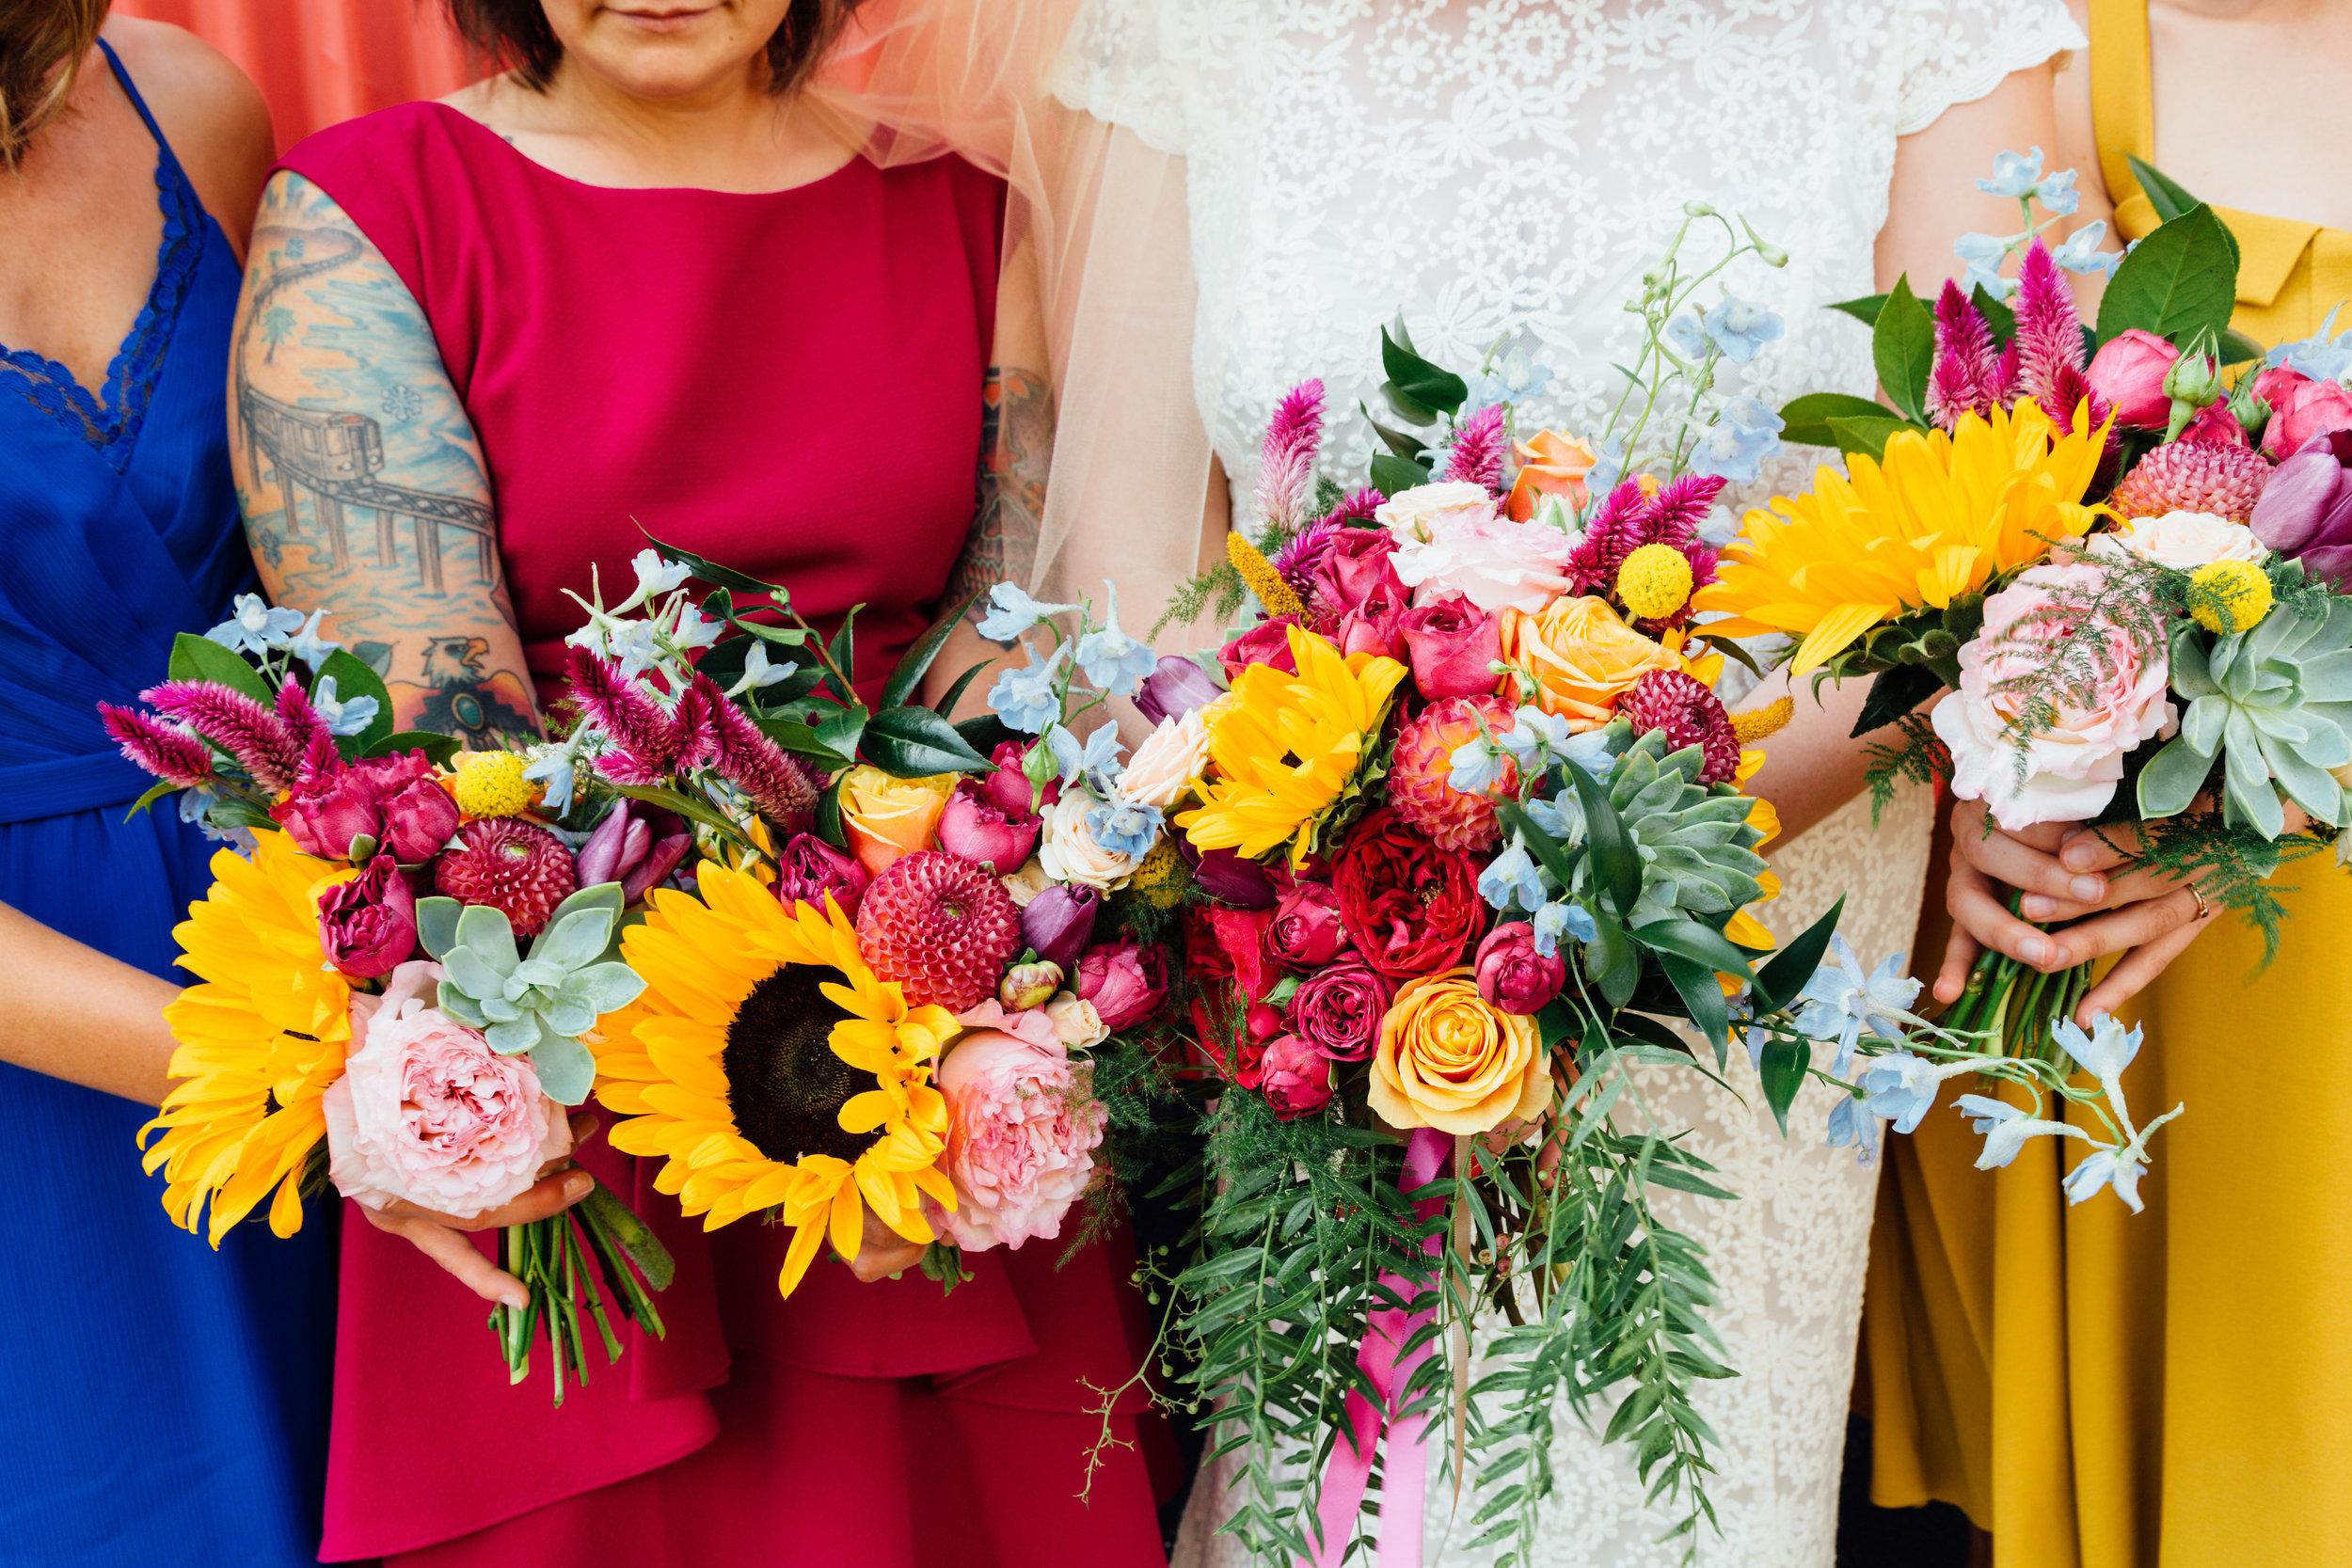 Sibyl_Sophia_Des_Moines_Iowa_Bright_Wedding_Florals_Bridesmaids.jpg